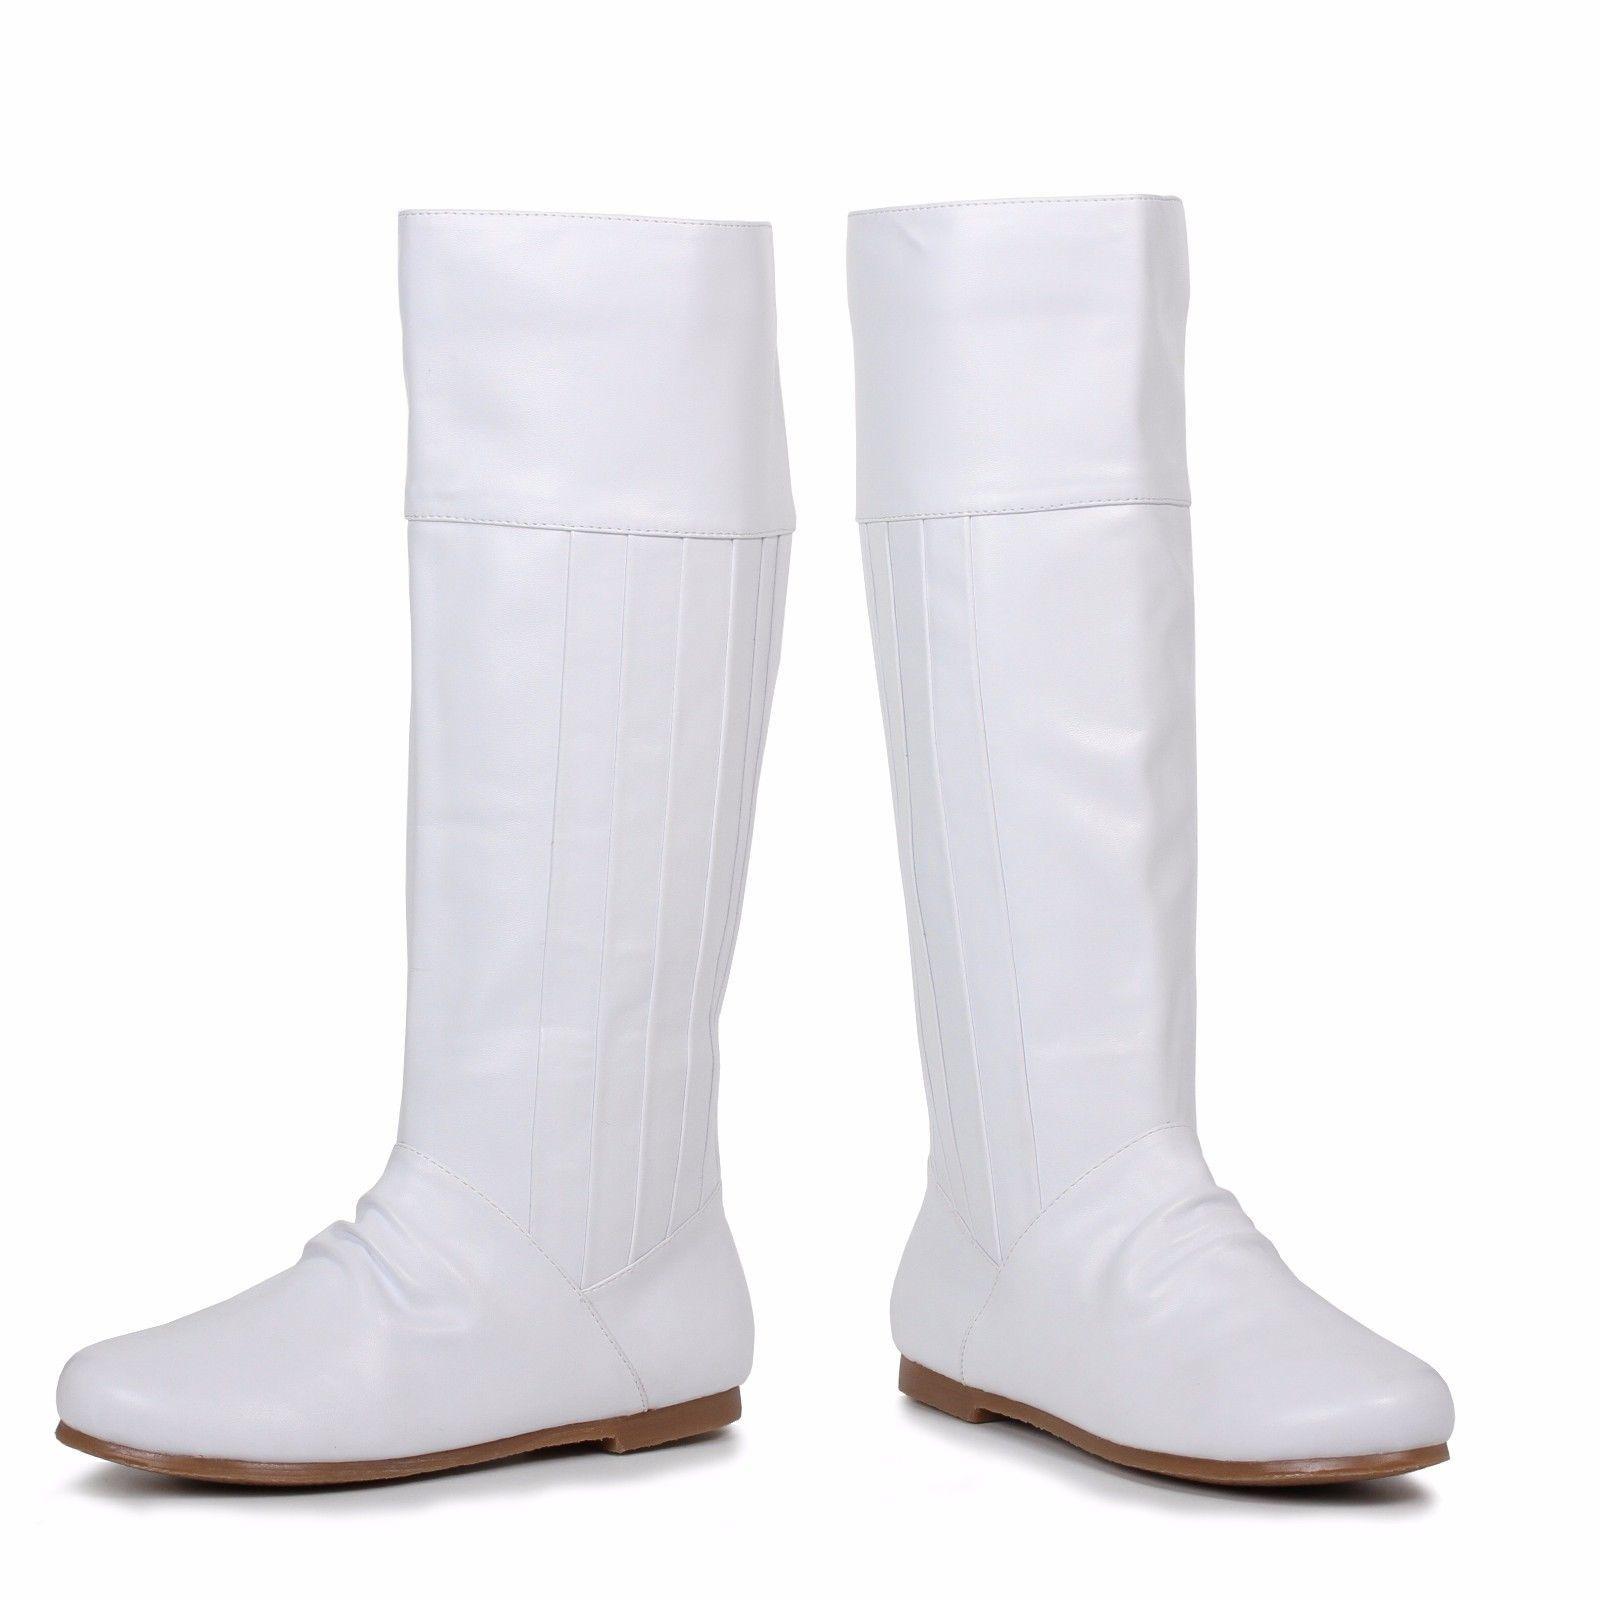 Ellie Shoes Leanna Tacco Scarpa Stivaletto Halloween Sexy Bianco Al Ginocchio